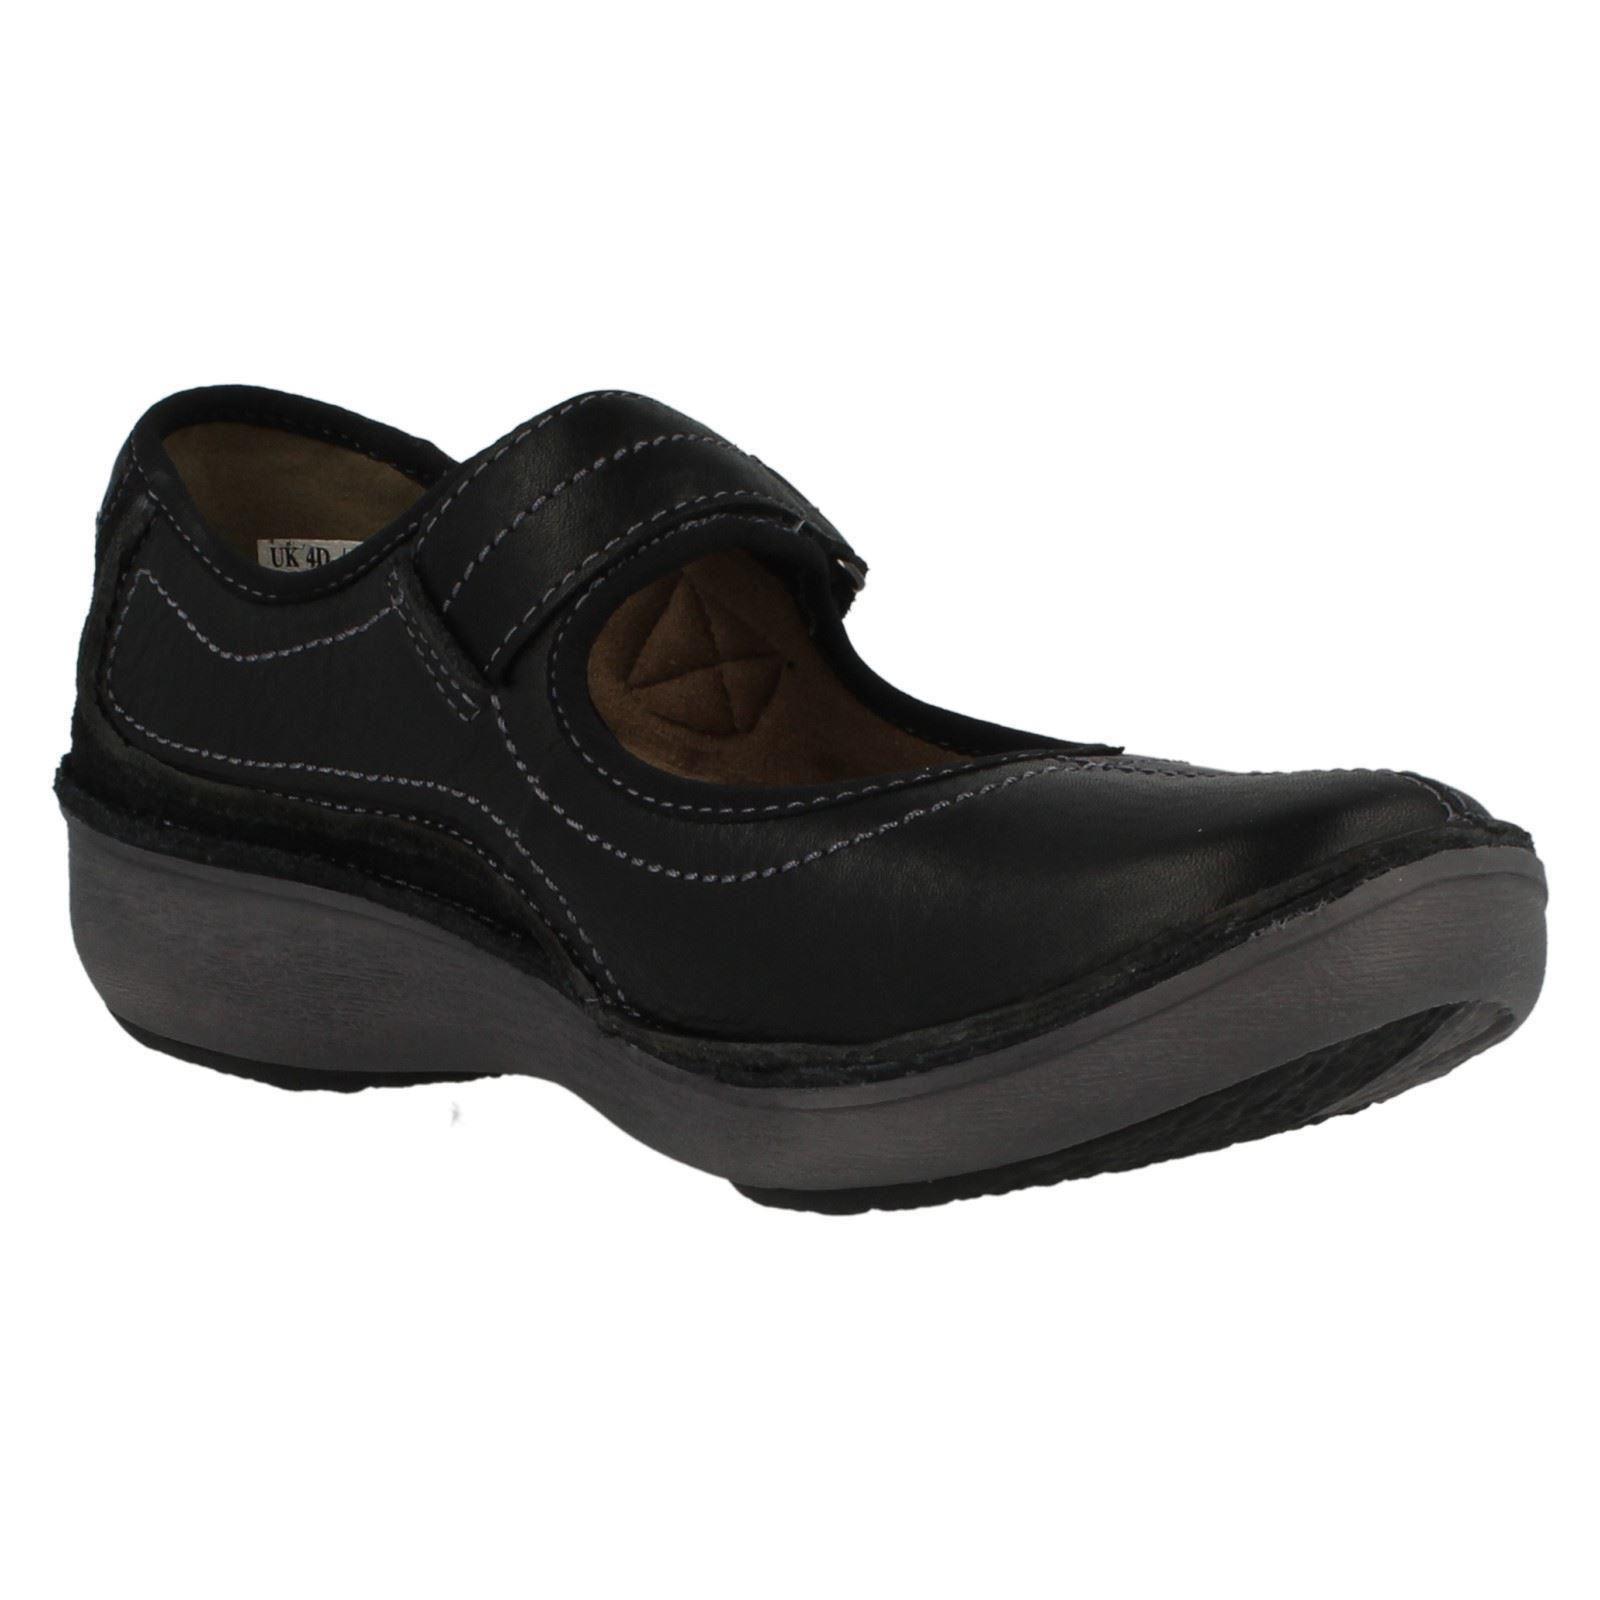 Ladies Clarks Shoes Wave Journey Ebay